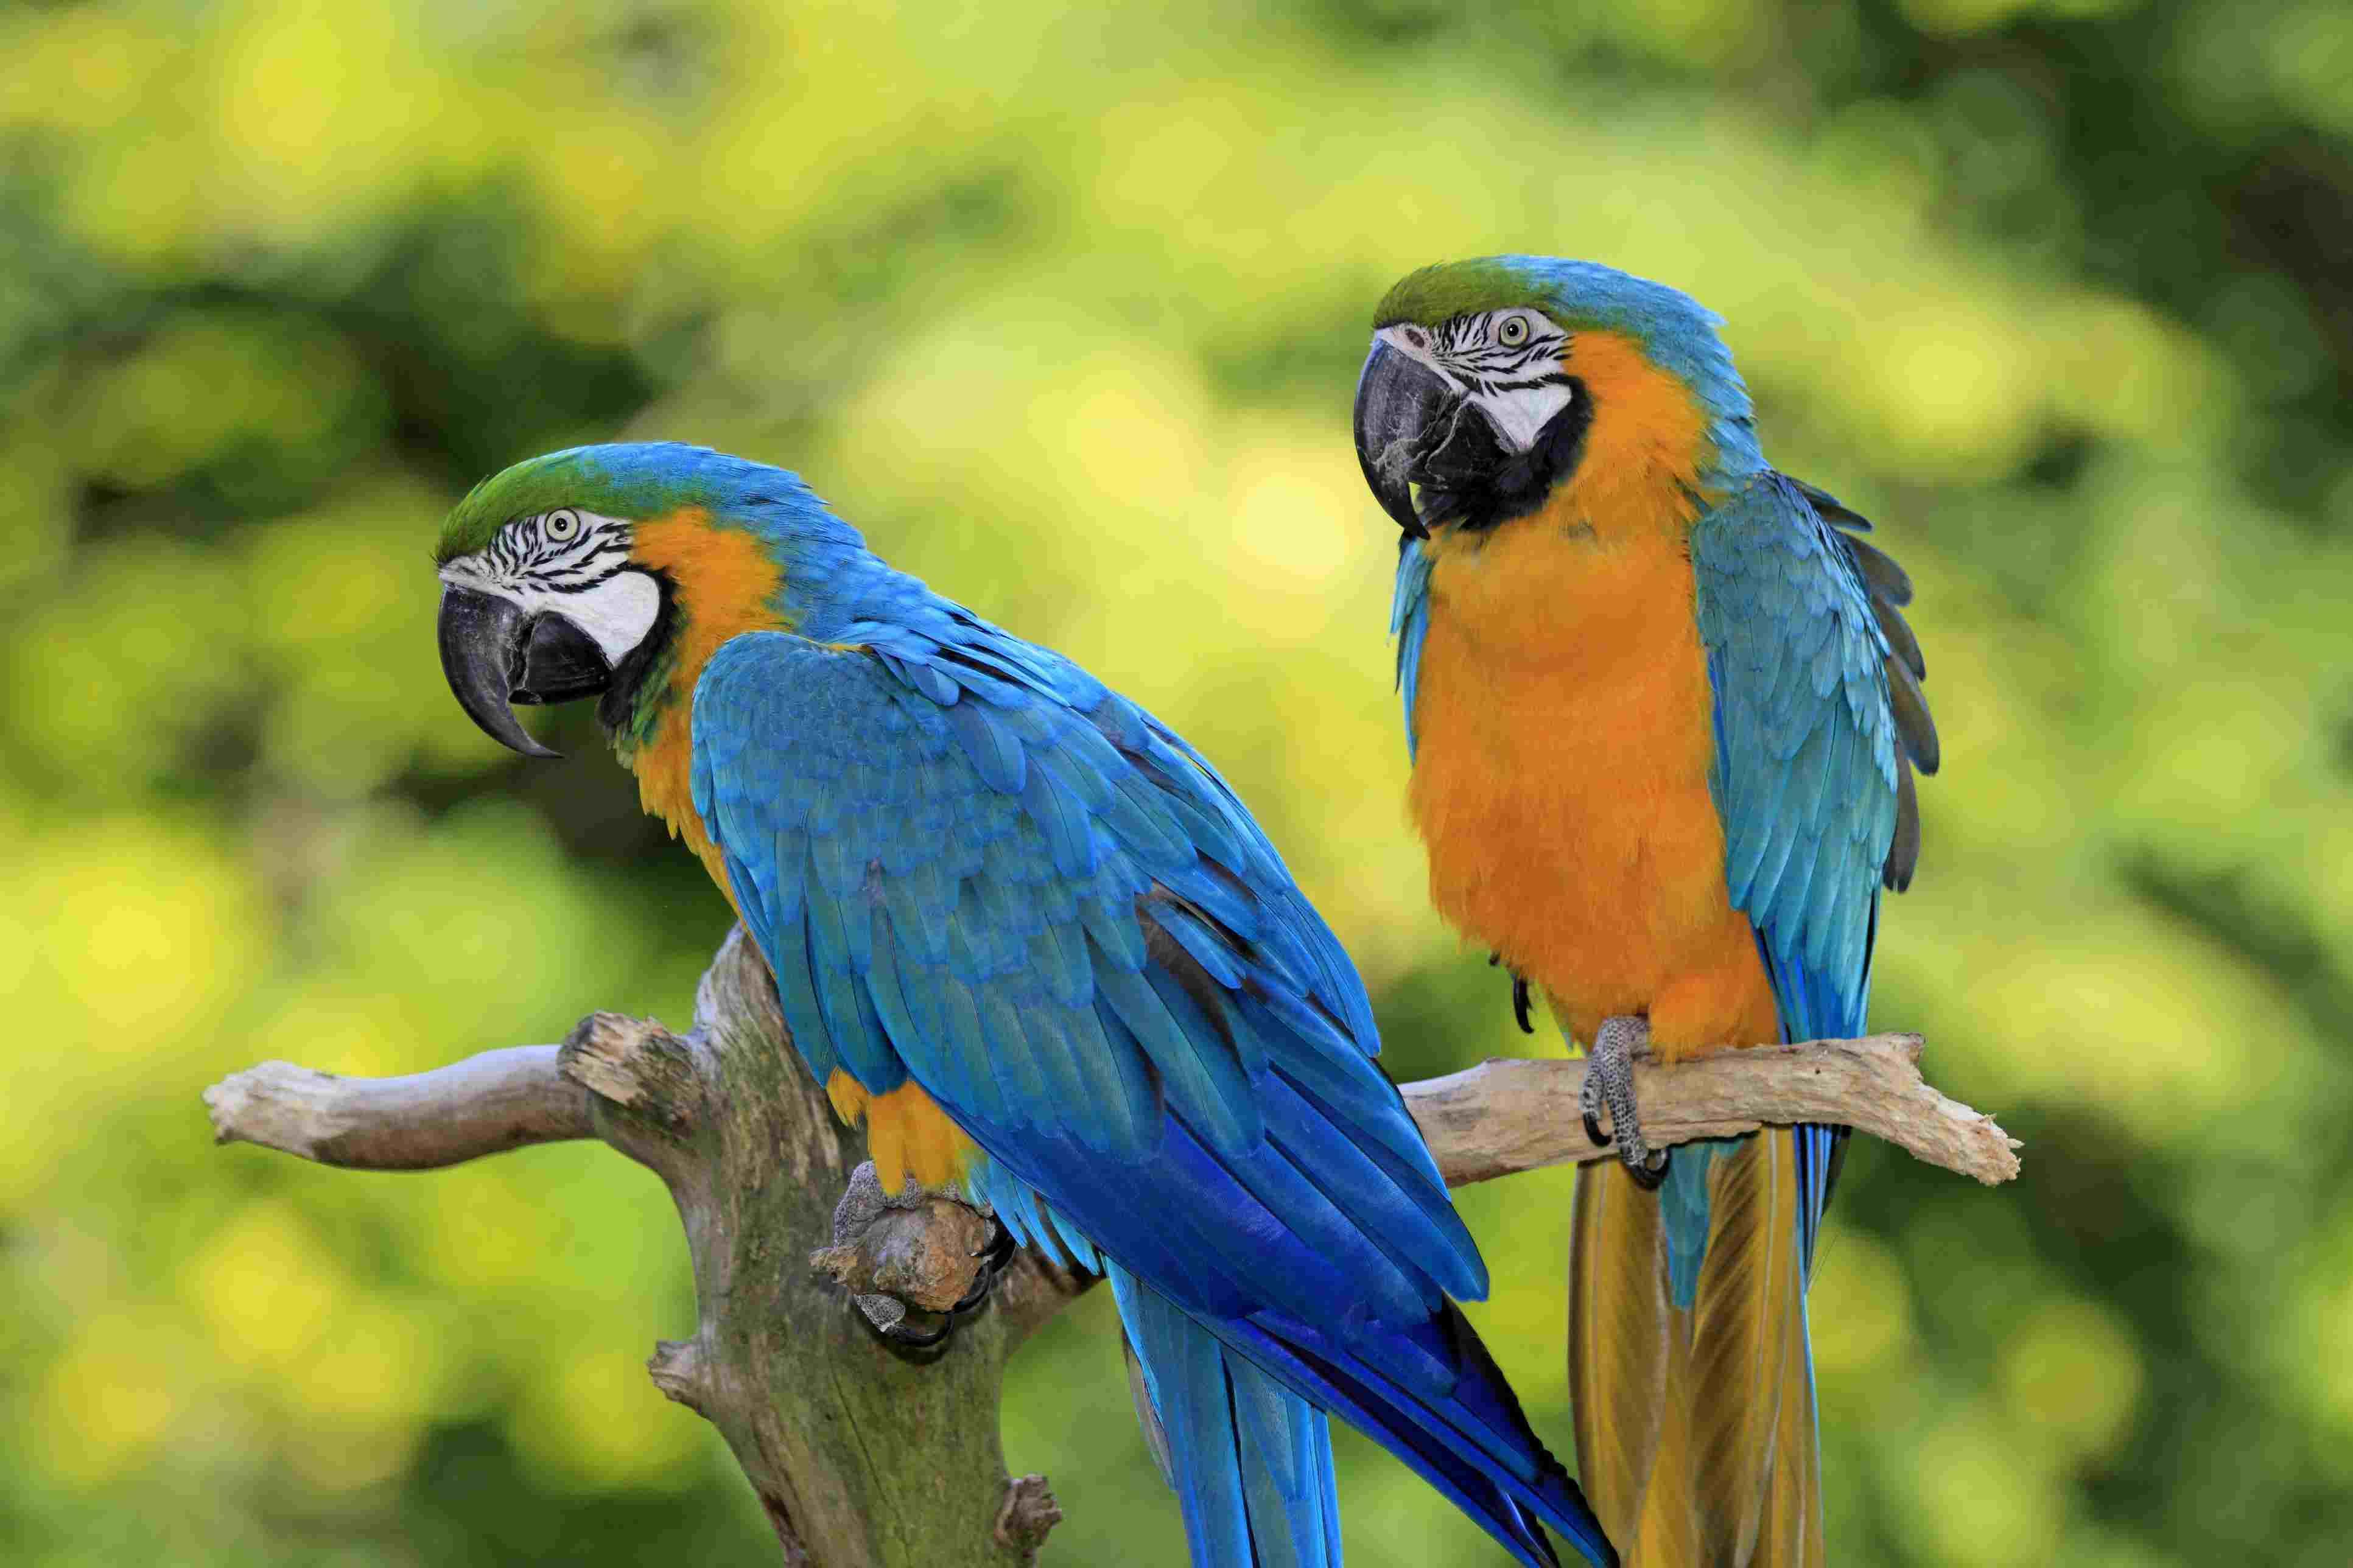 Blue and Yellow Macaws (Ara ararauna), pair, native to South America, captive, Wachenheim, Germany